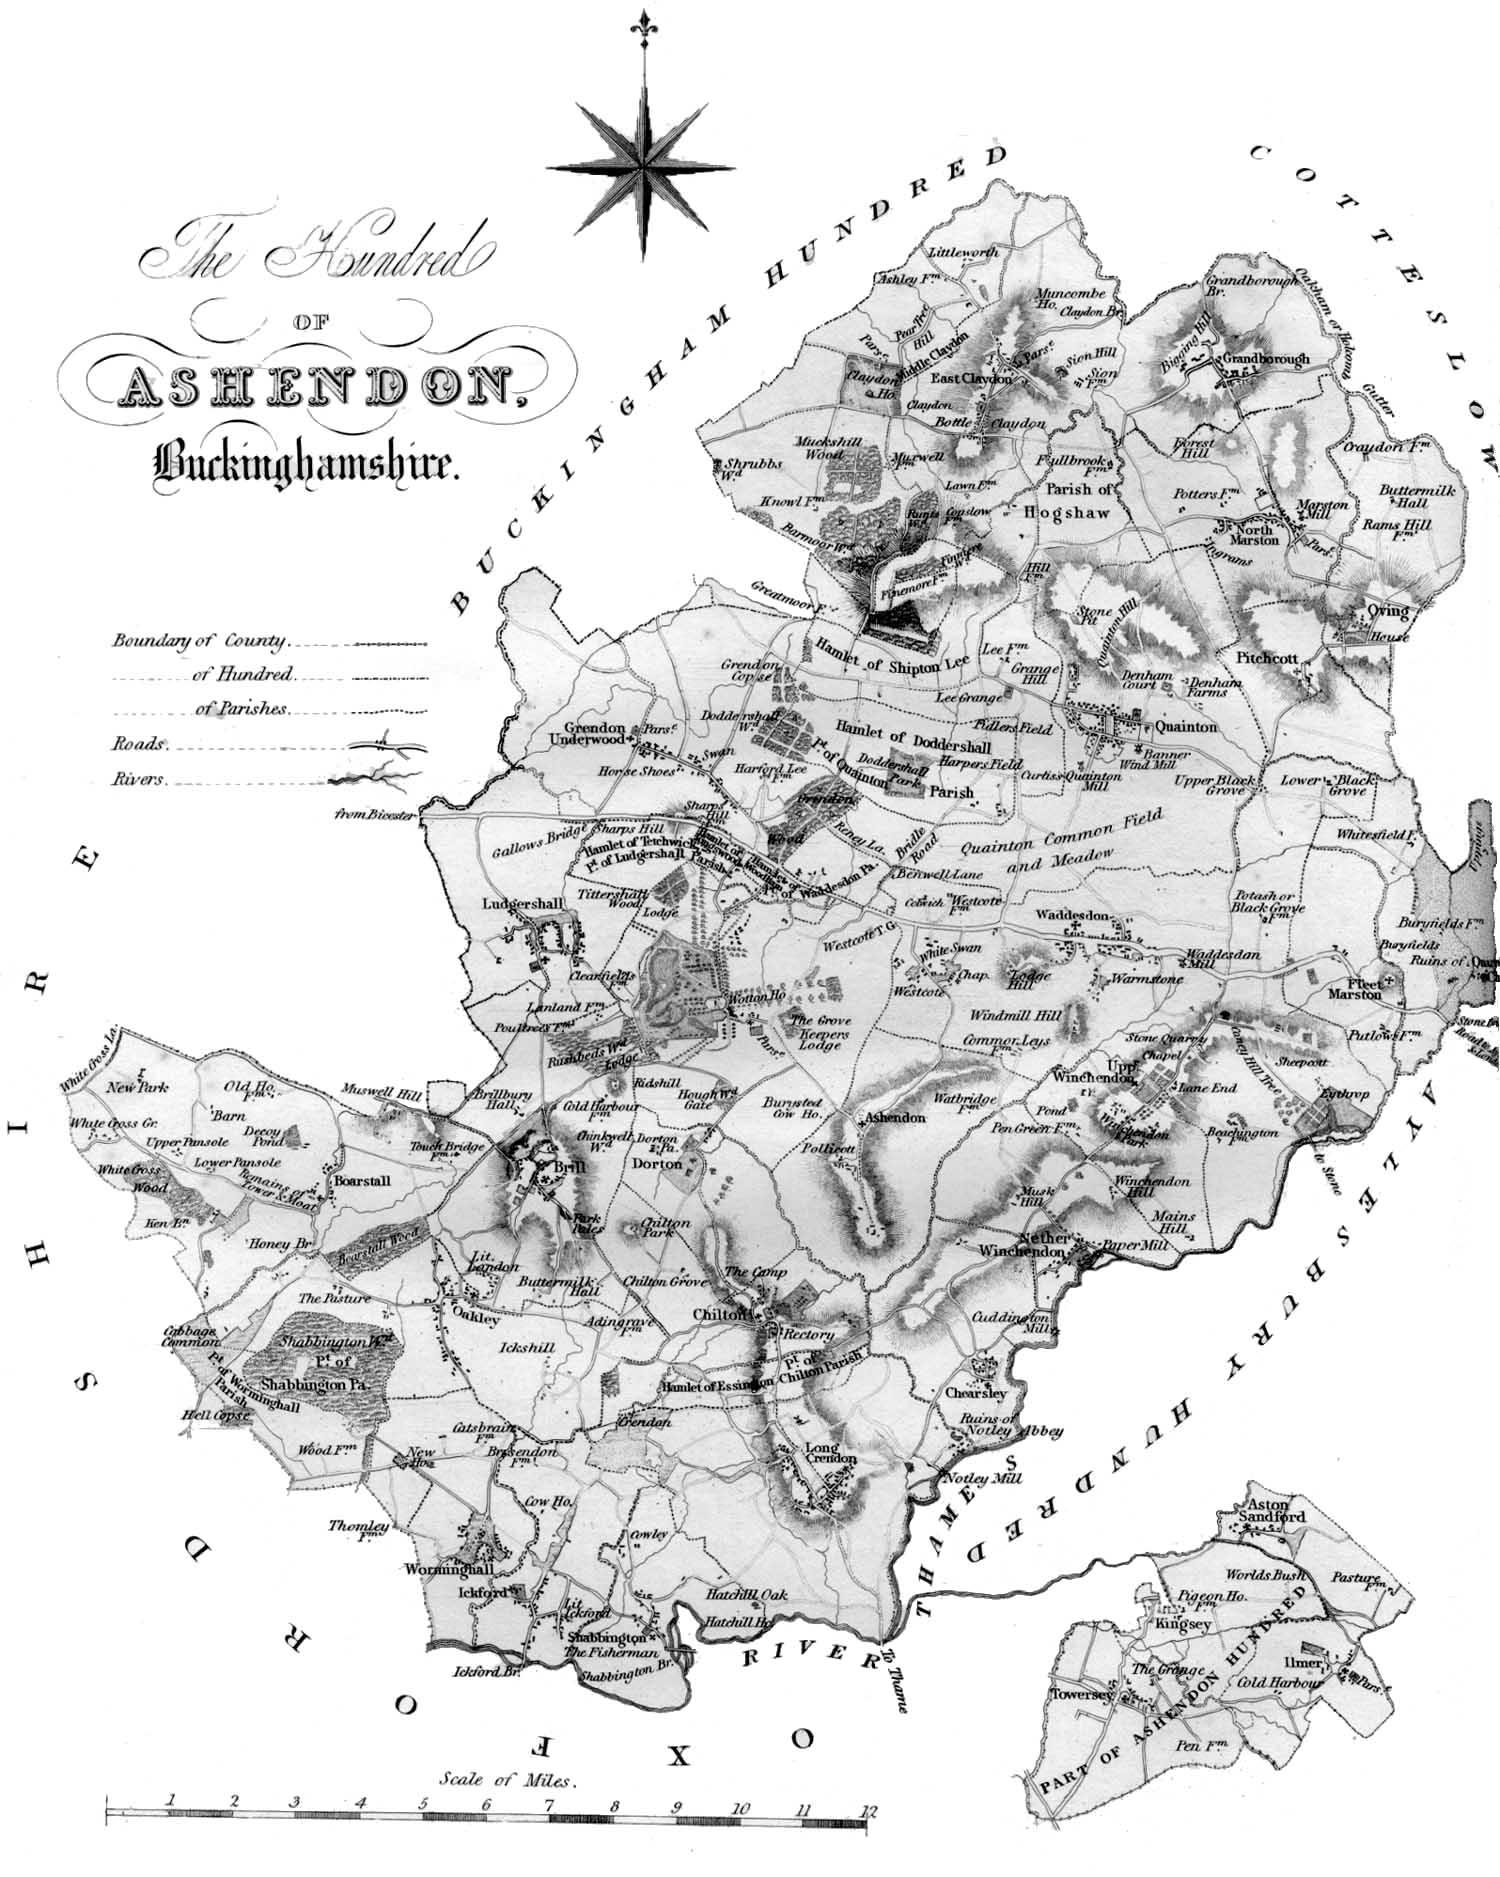 Map of the Ashendon Hundred